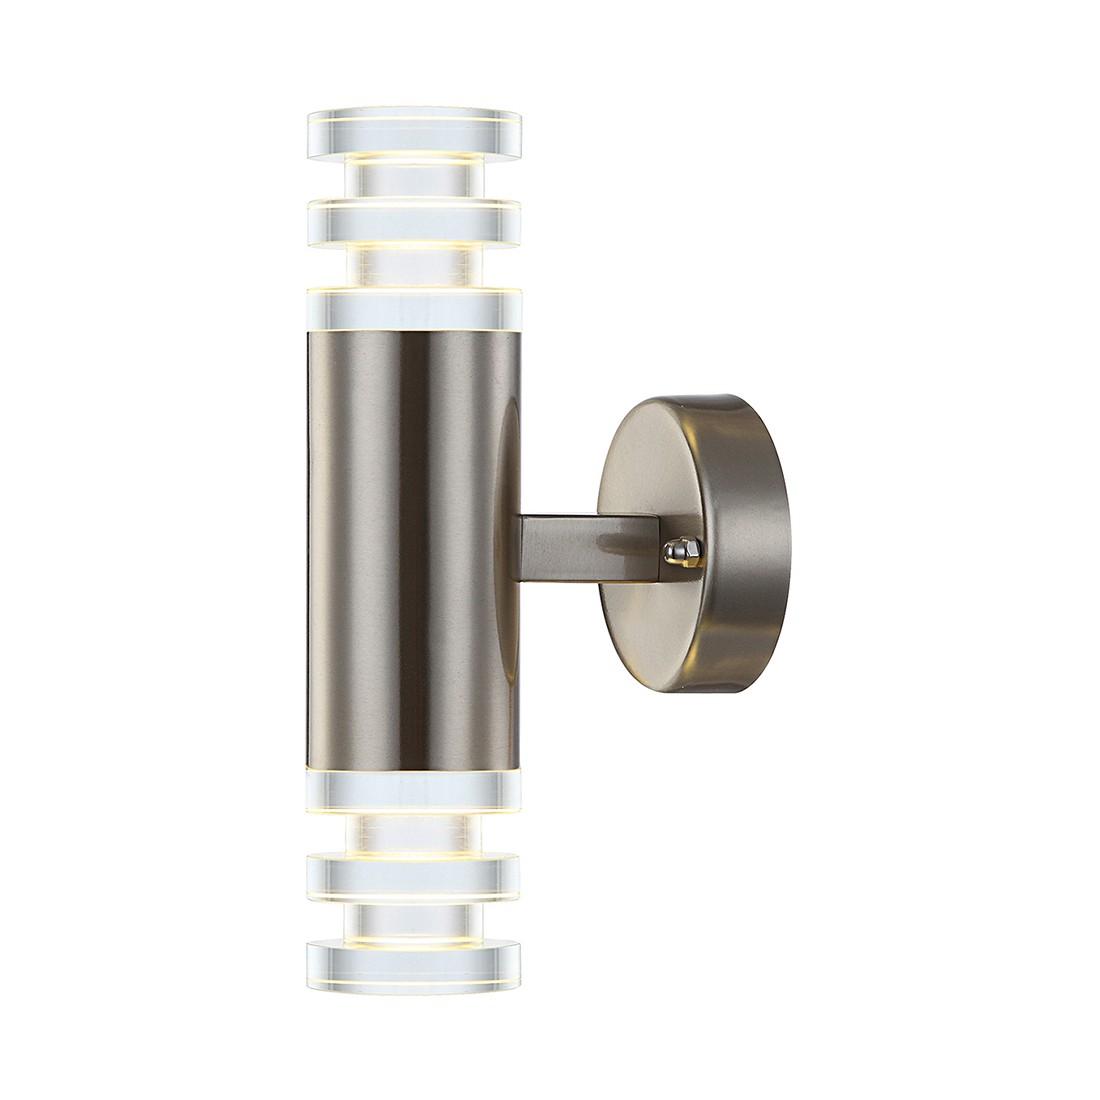 LED Außenleuchte Edelstahl IV By Globo ○ Stahl/Glas ○ Silber  Globo  Lighting A+ Günstig